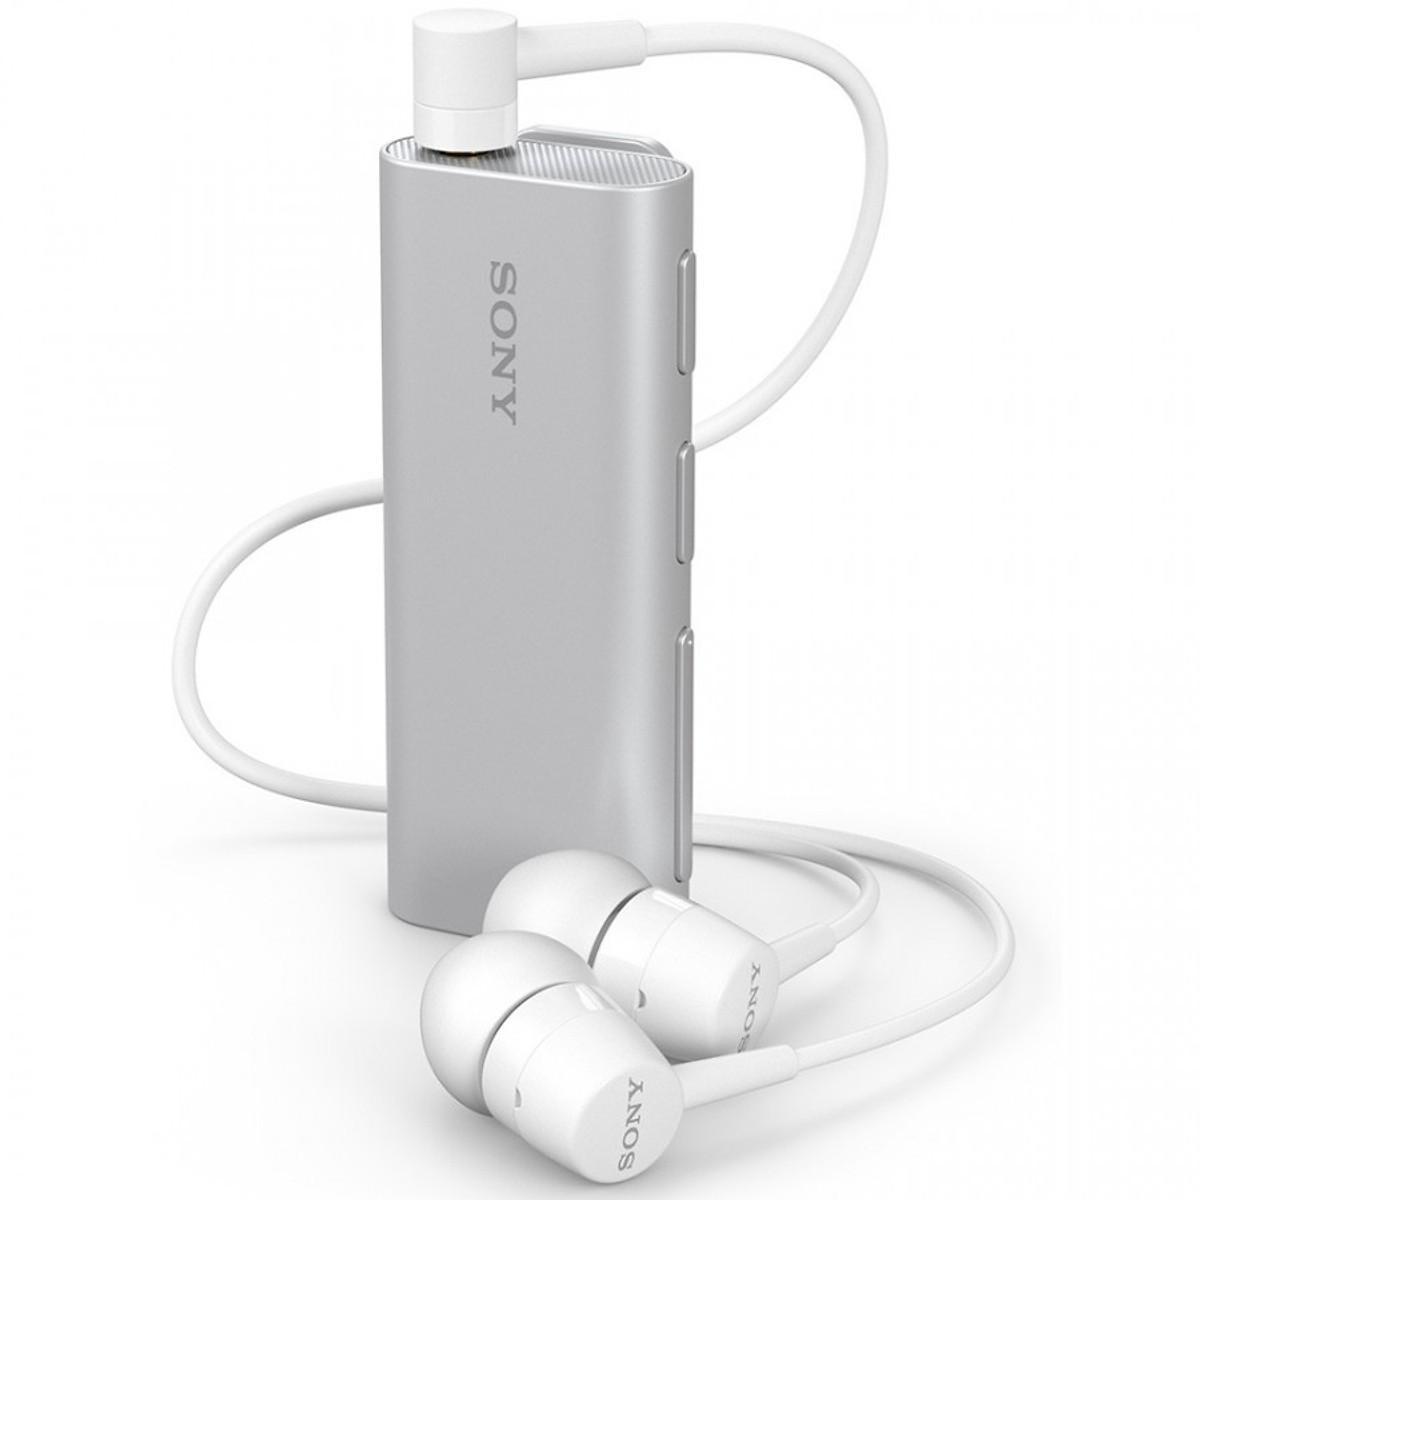 Tai Nghe SONY Bluetooth Stereo SBH56